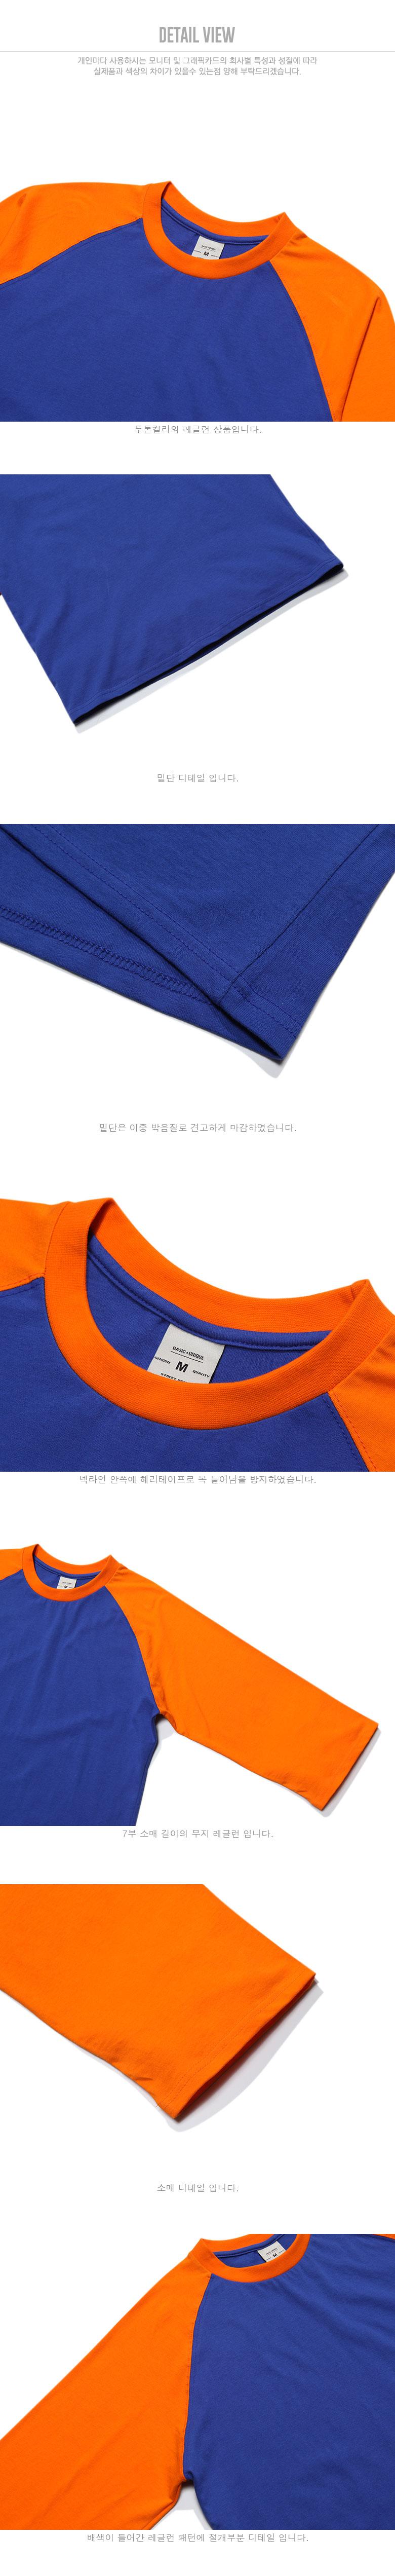 20190221_fp_JHLT1169_orangeblue_detail_02.jpg